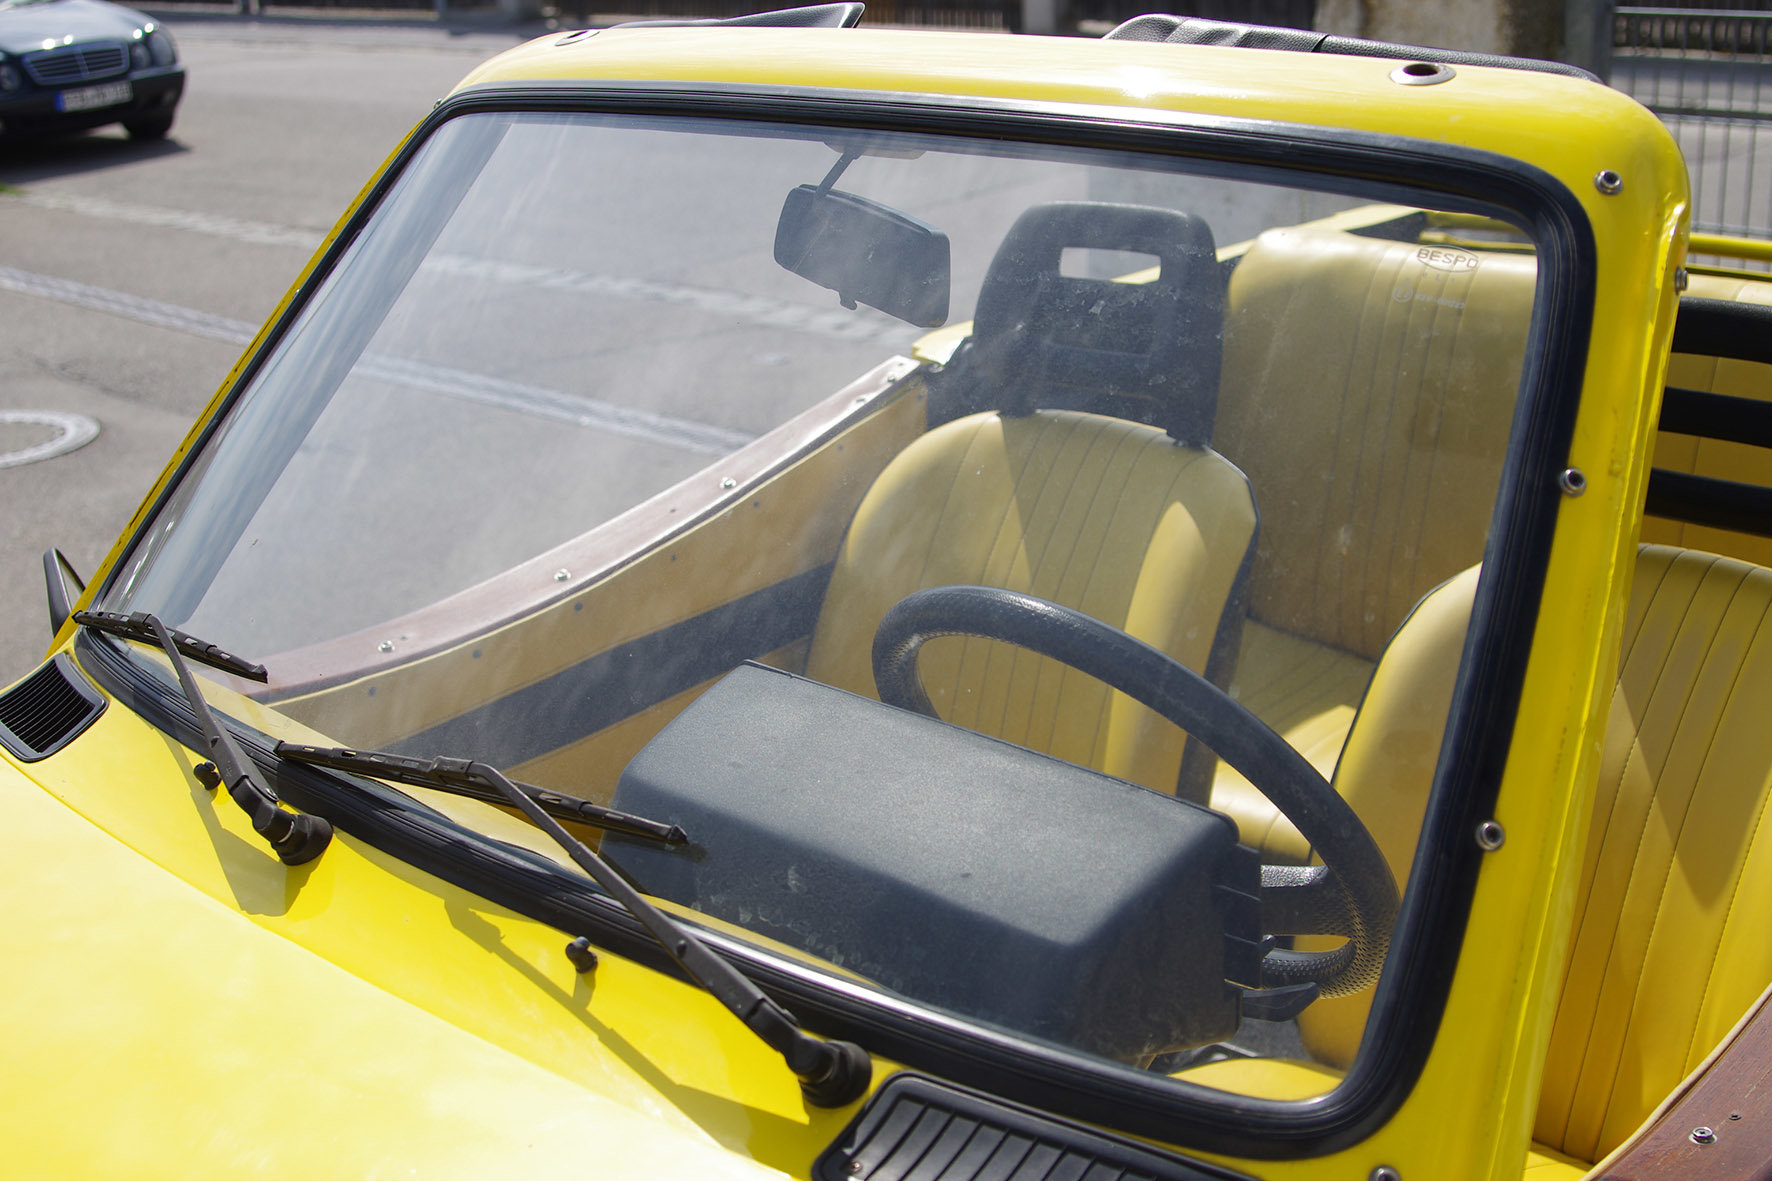 1988 Fiat 126 - Gavello - very rare  SOLD (picture 6 of 6)